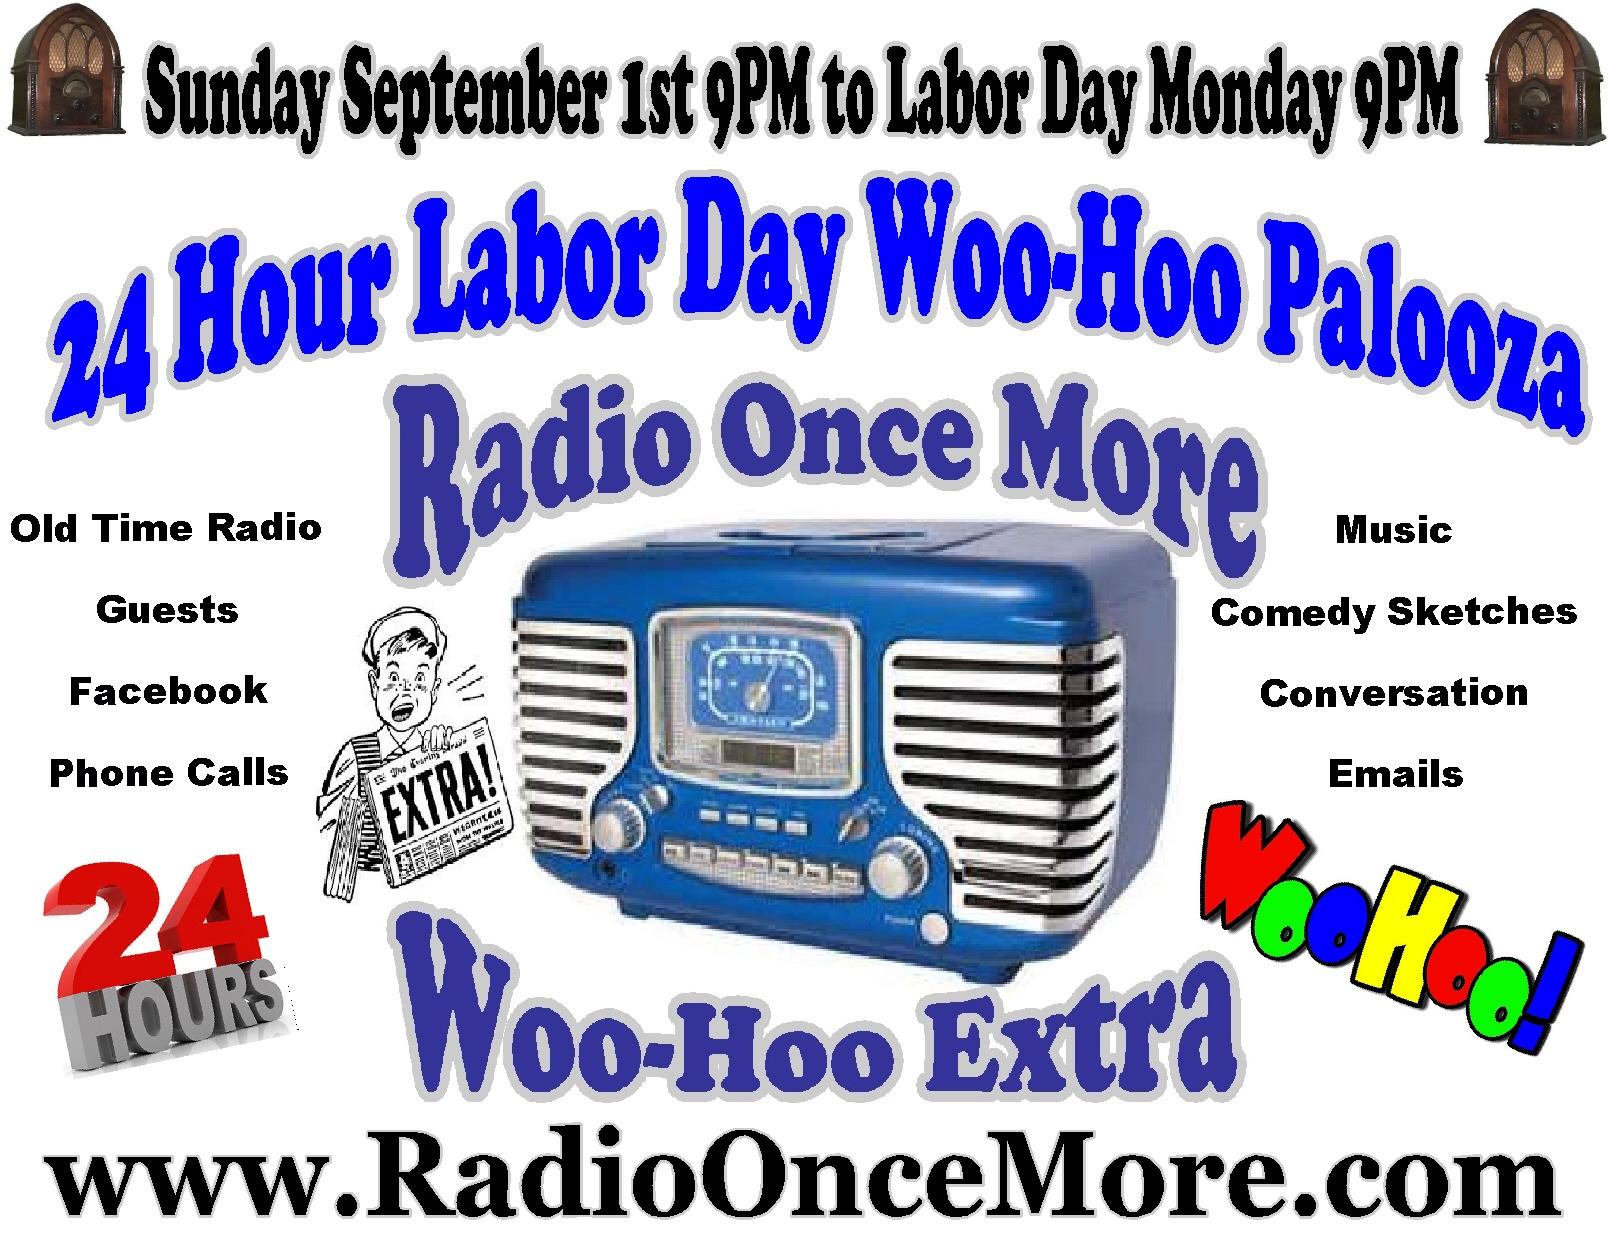 Radio Once More - Woo-Hoo Palooza